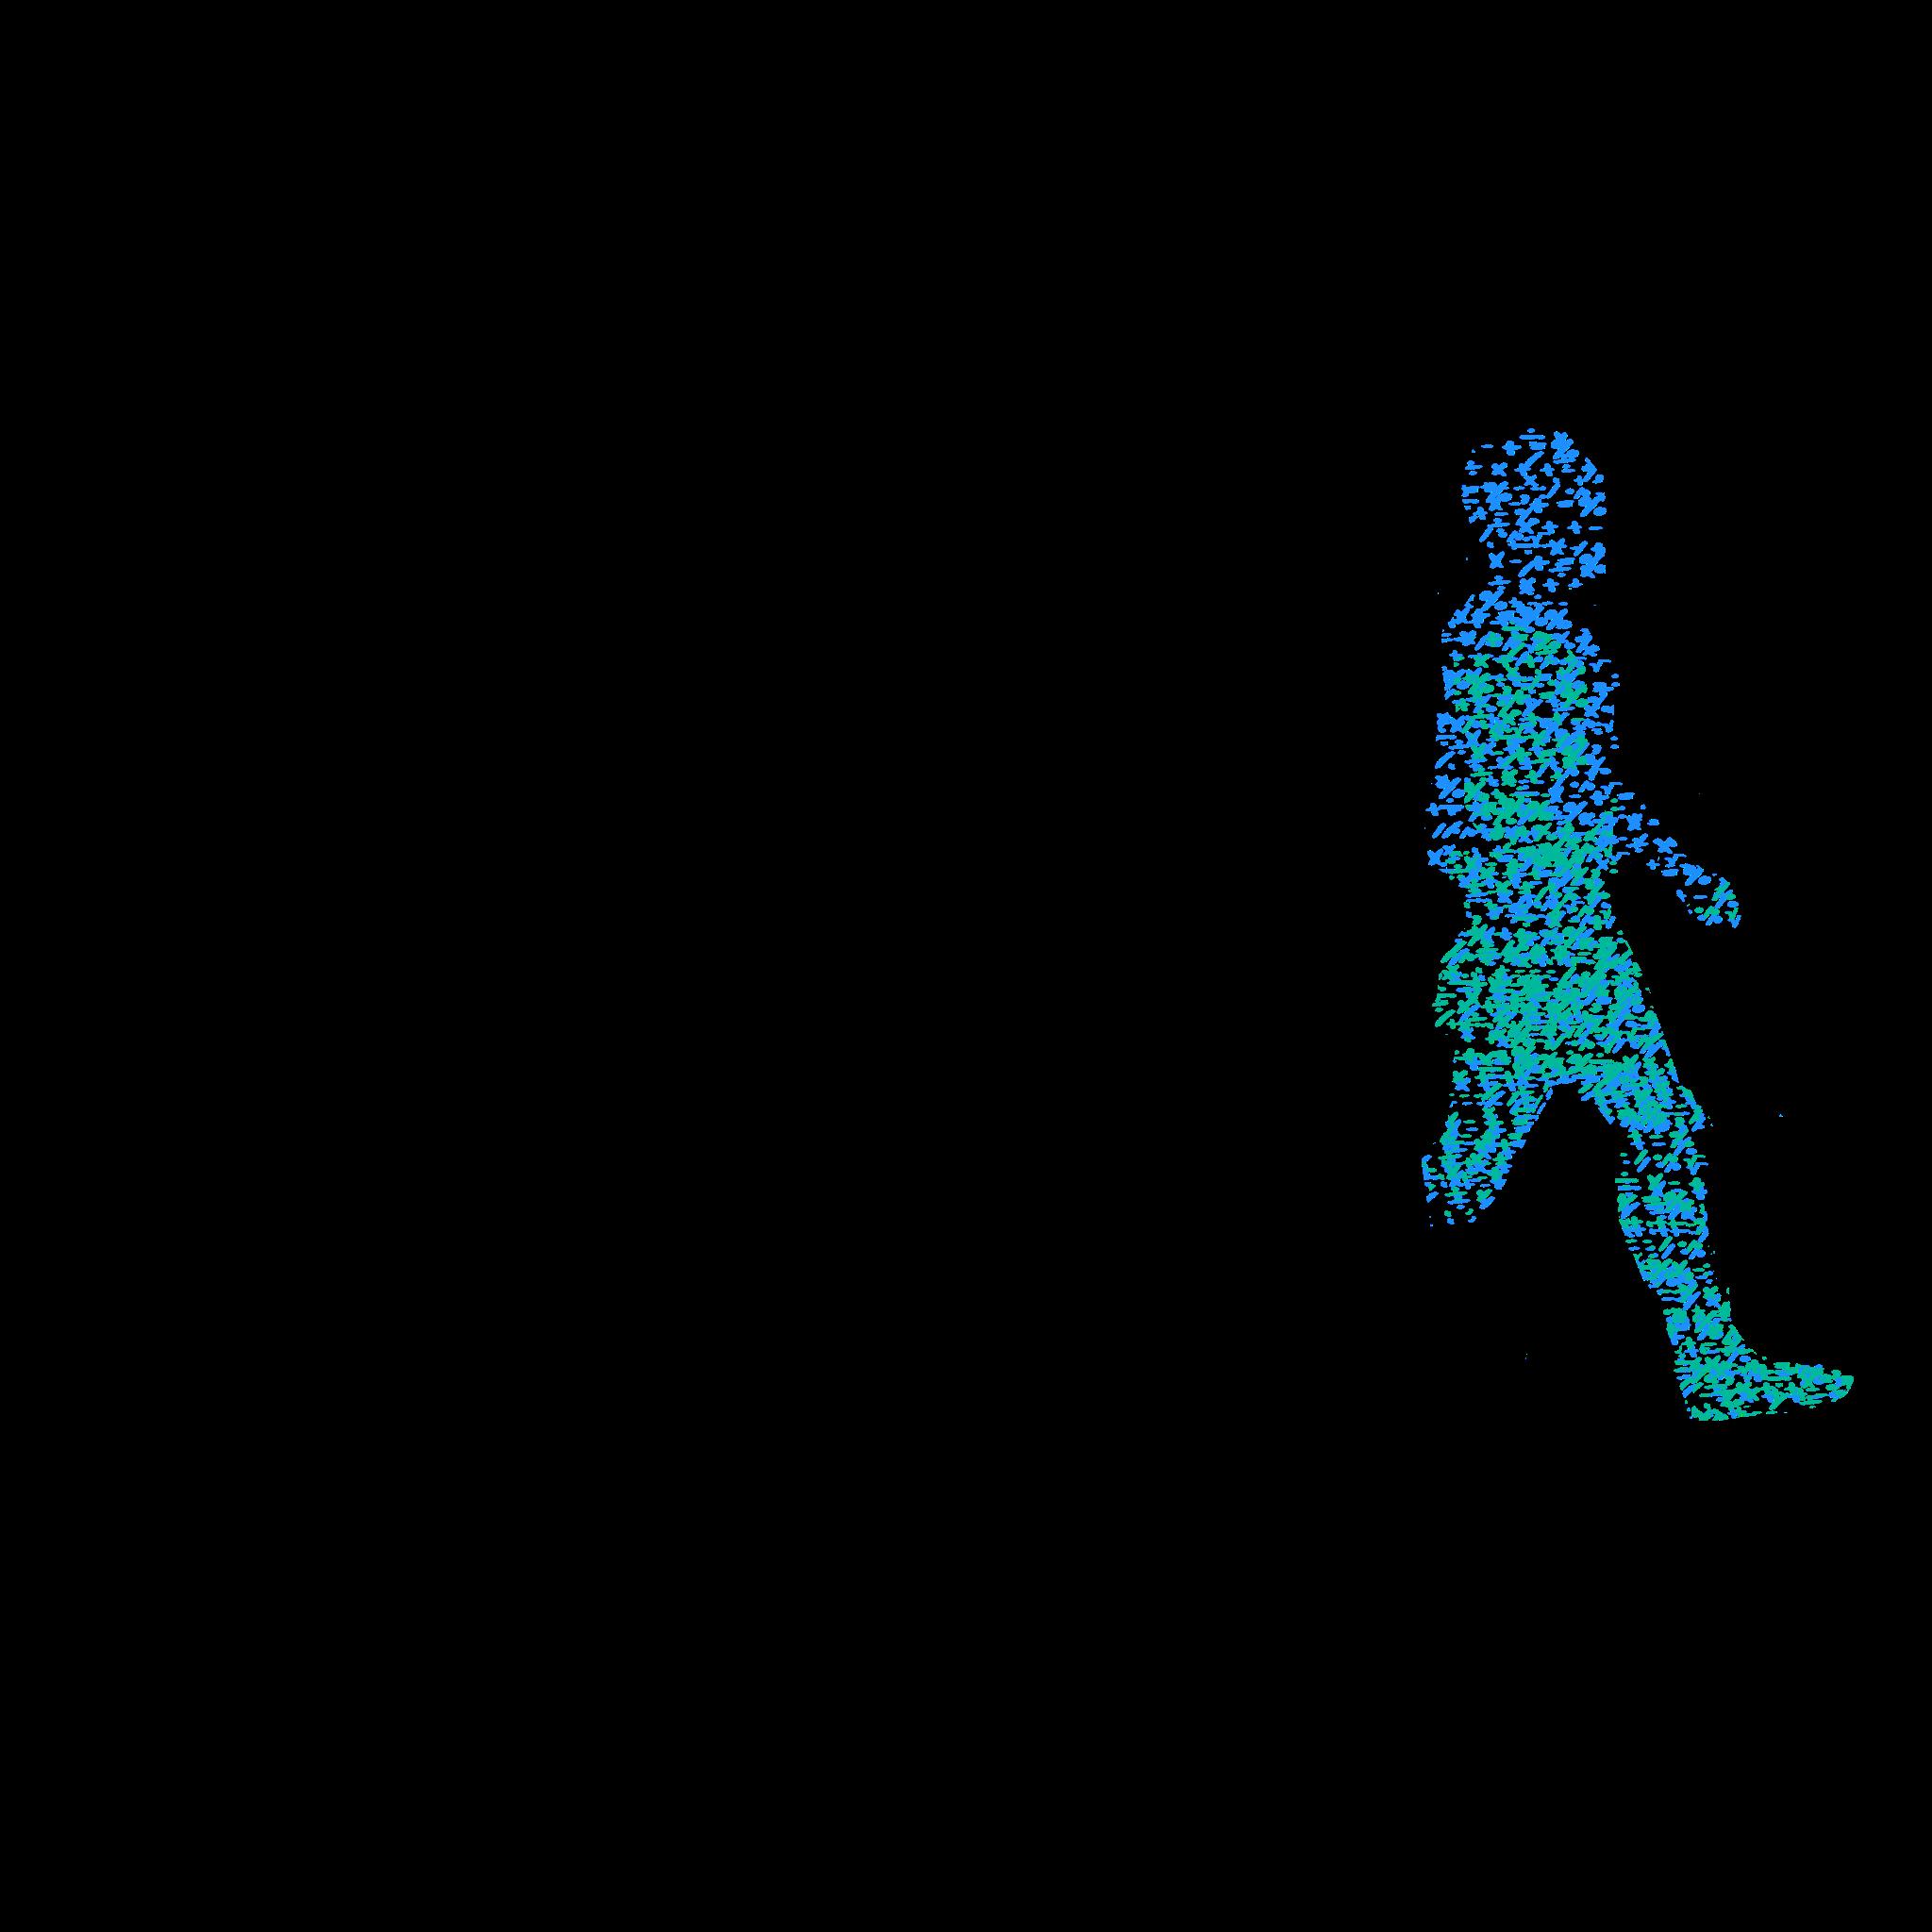 halsa-i-siffror-illustration-maja-larsson